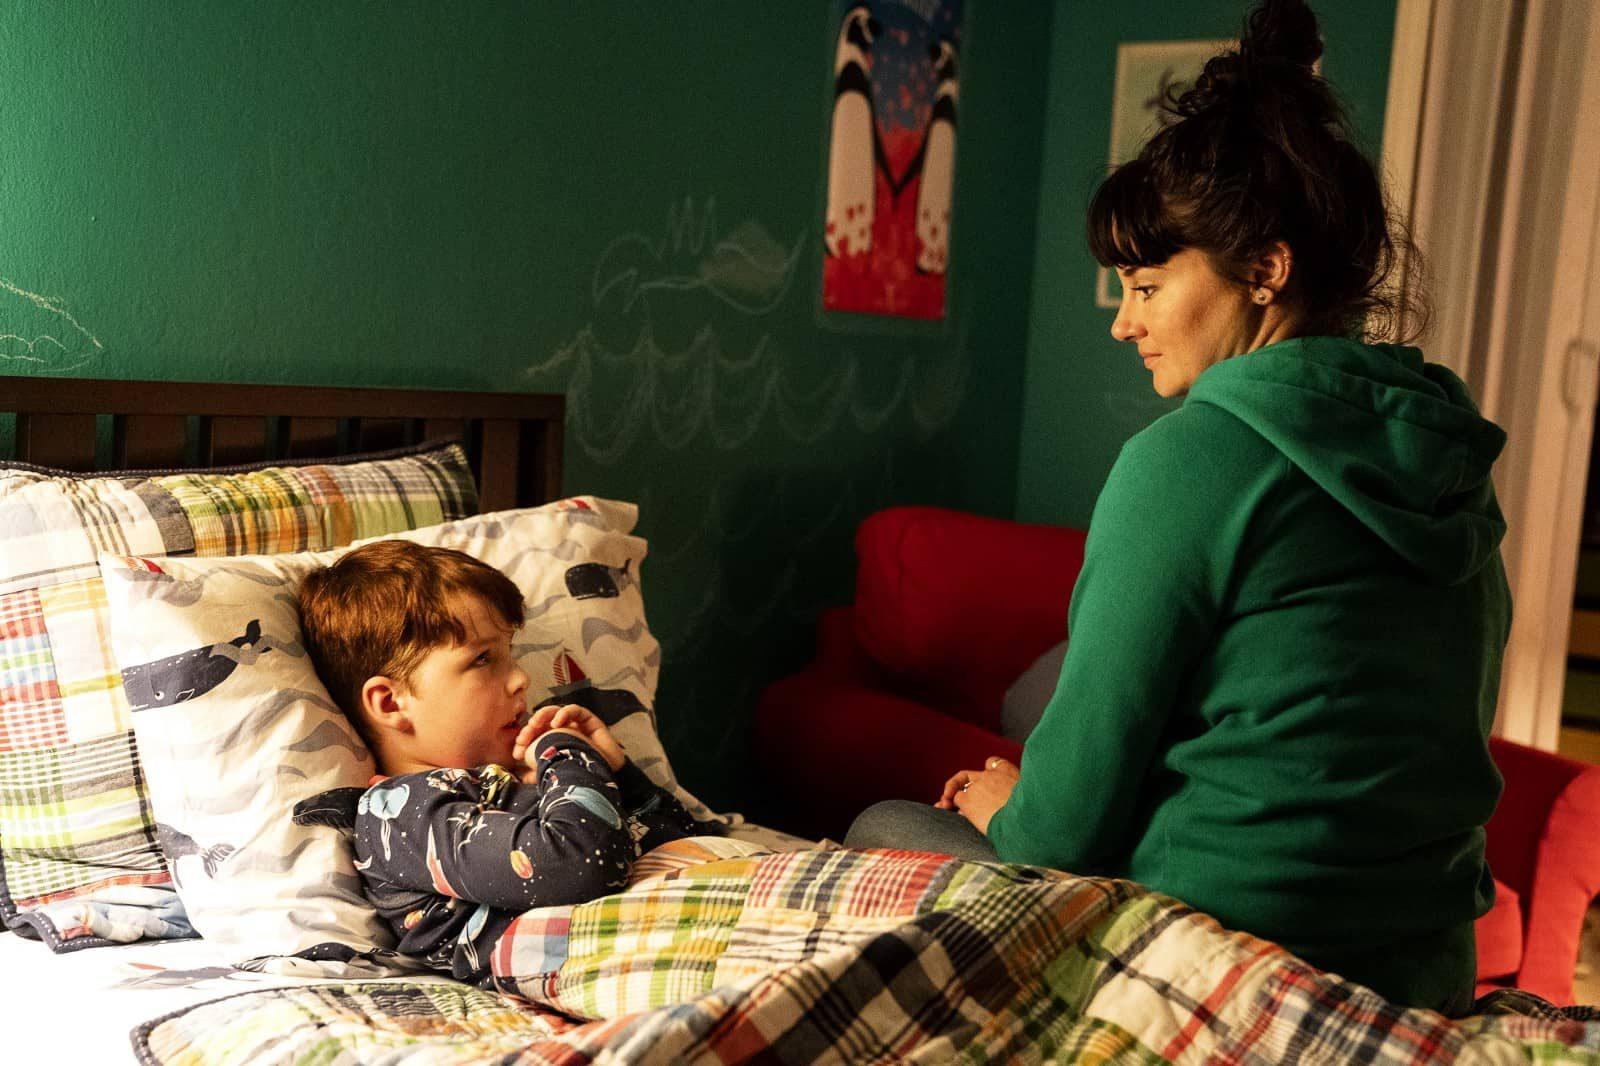 Iain Armitage como Ziggy y Shailene Woodley como Jane en Big Little Lies 2×05